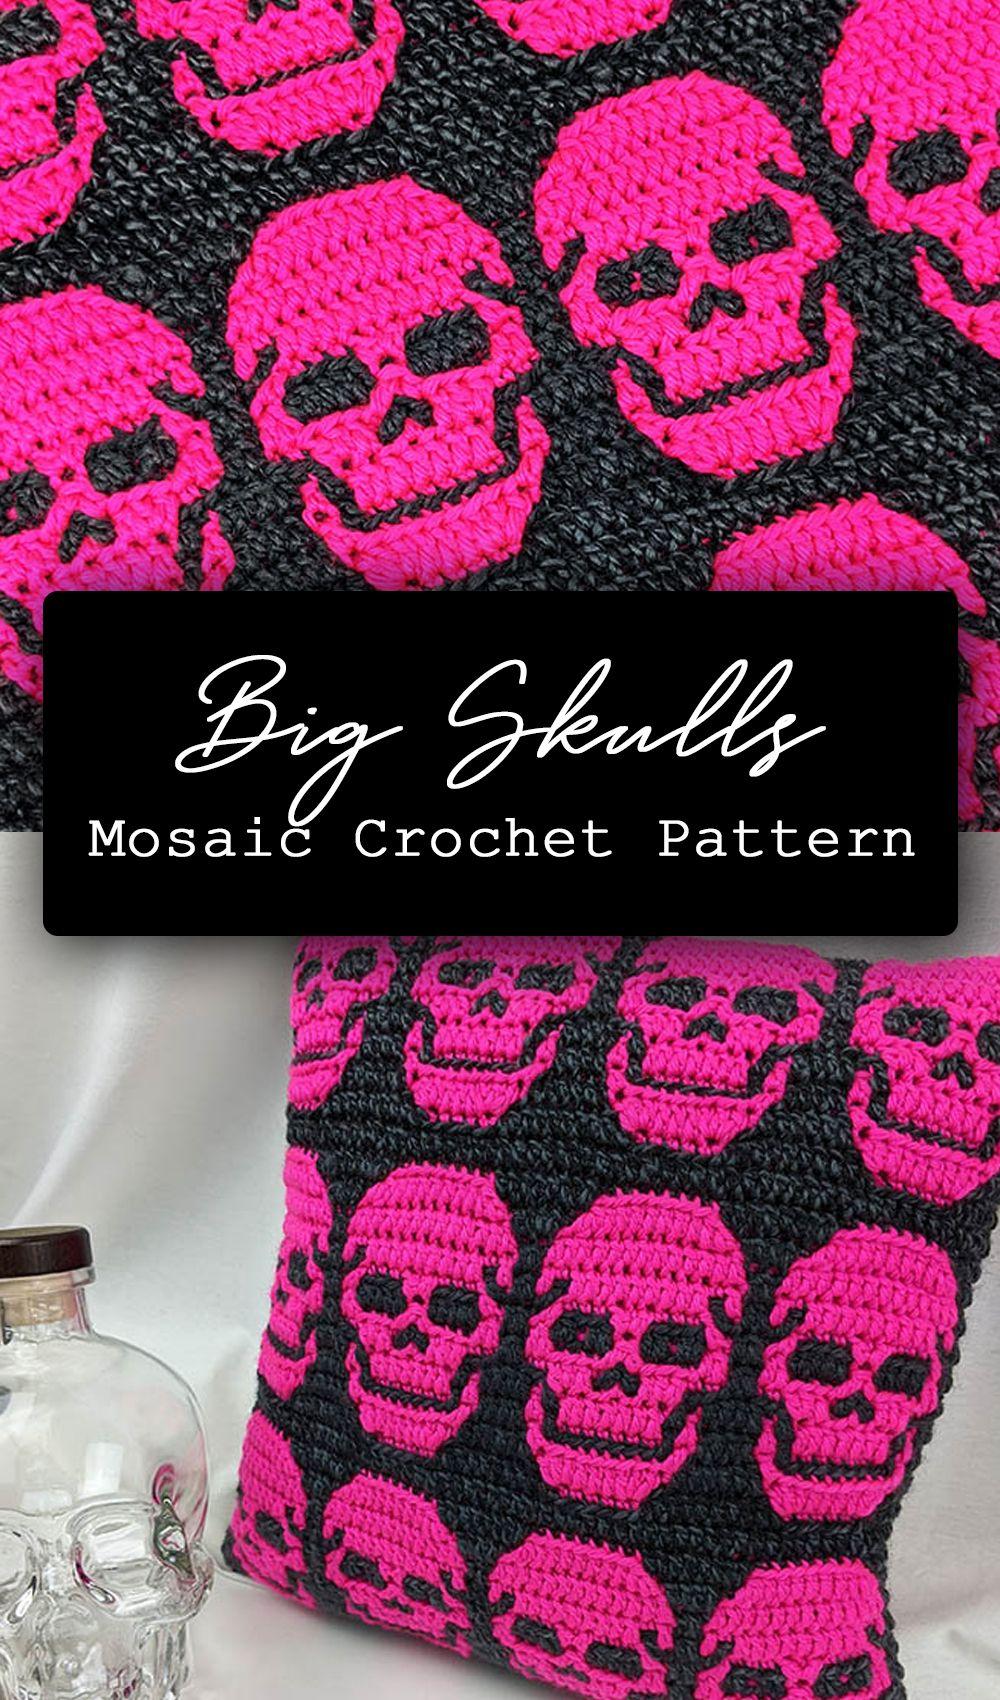 Big Skulls Mosaic Crochet Pattern by Sixel